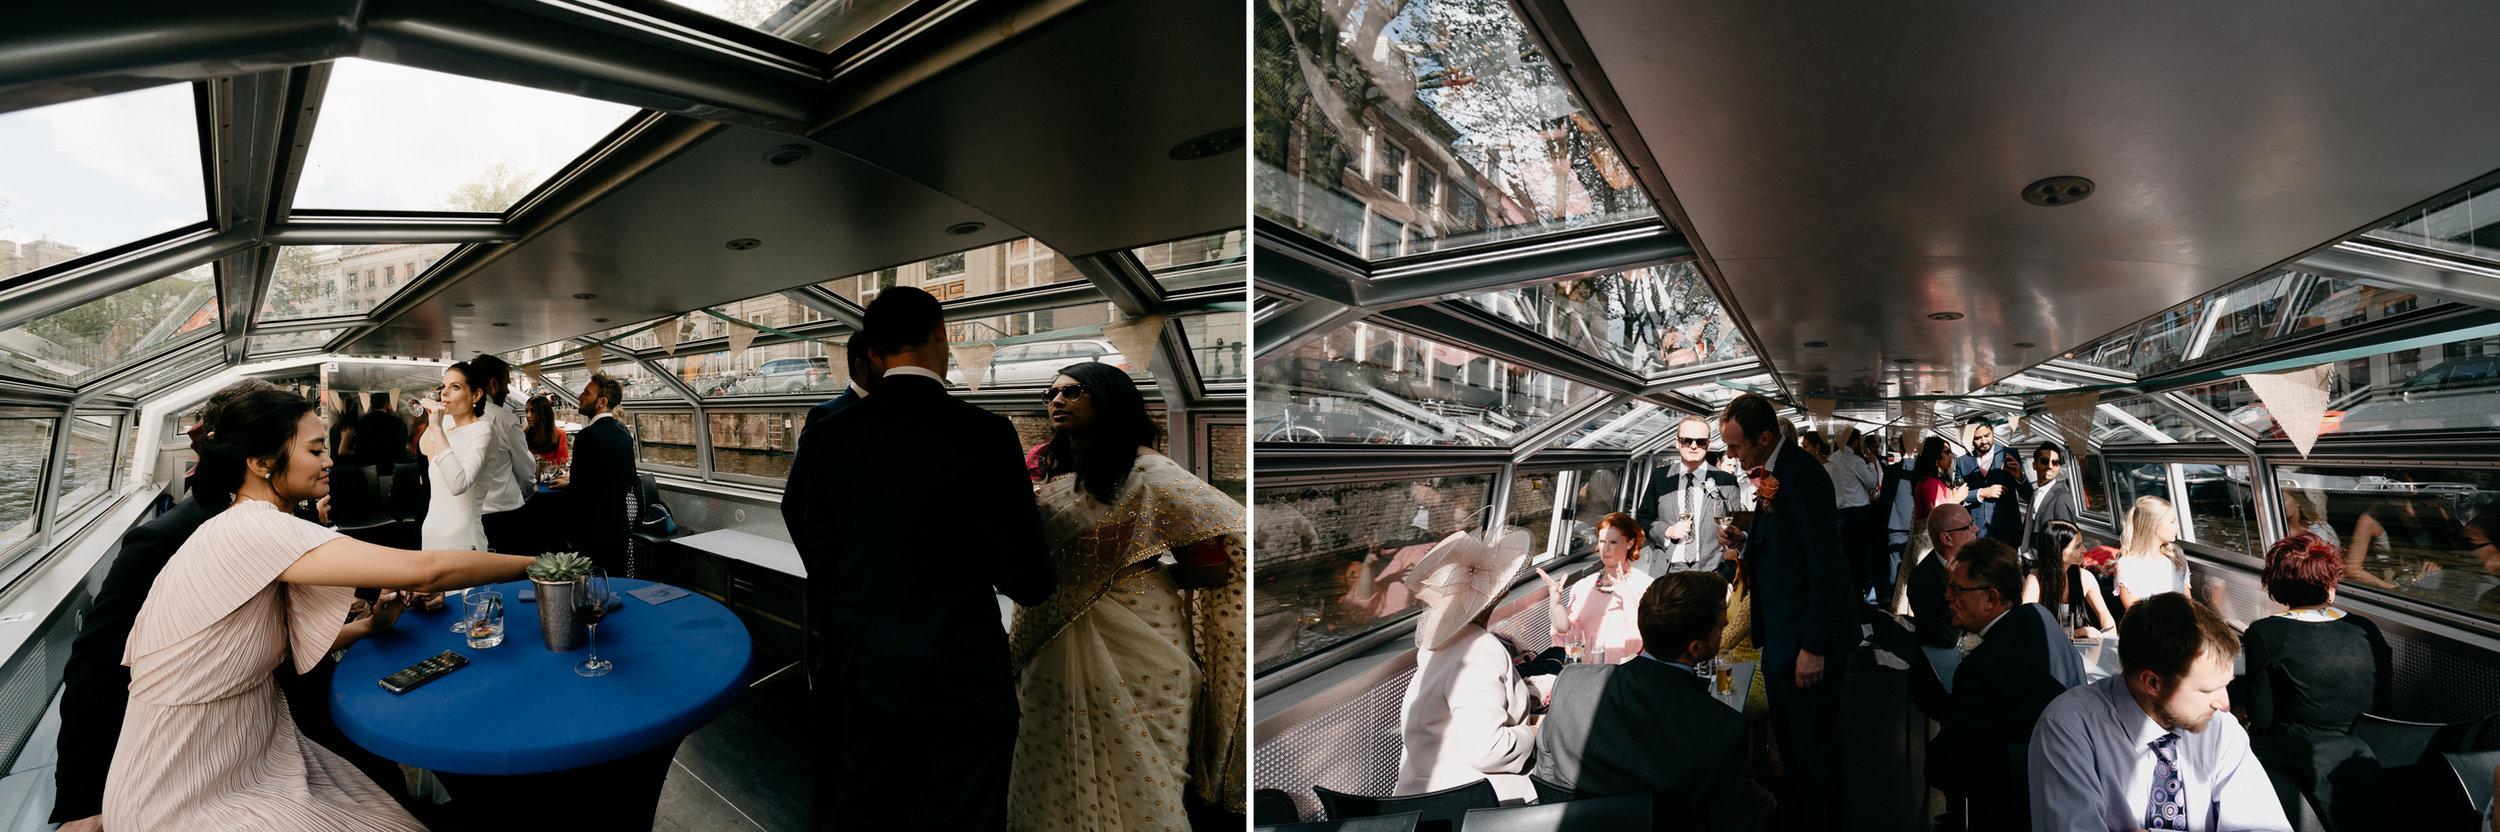 bruidsfotografie-trouwfotograaf-wedding-photographer-amsterdam-James-Jantine-232 copy.jpg